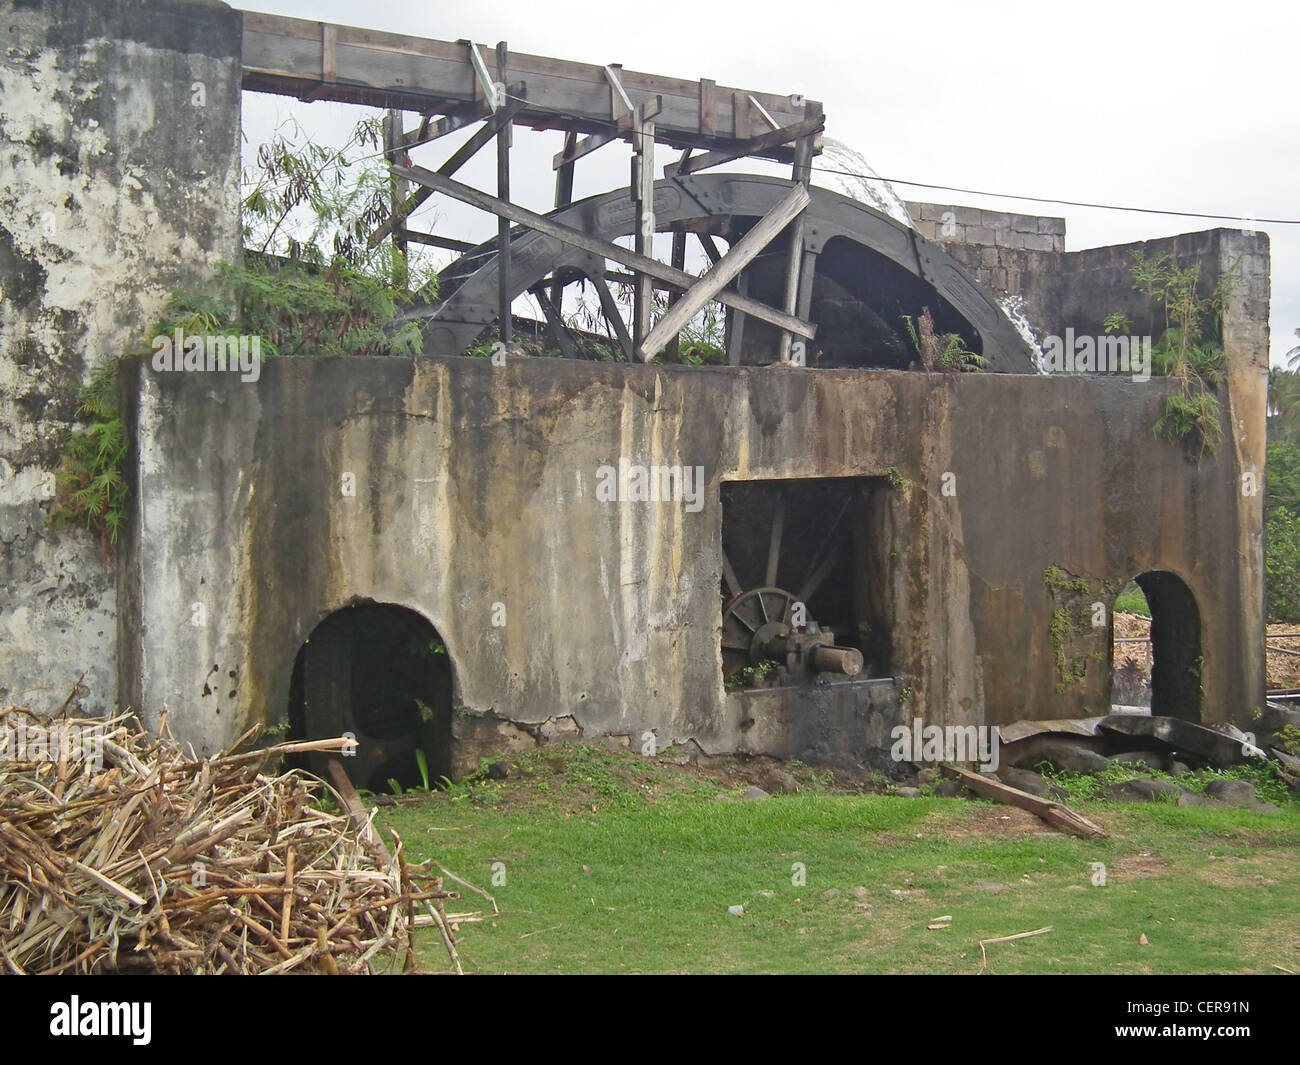 GRENADA Rum factory - 18th century water-wheel power to crush the sugar cane. Photo Tony Gale - Stock Image